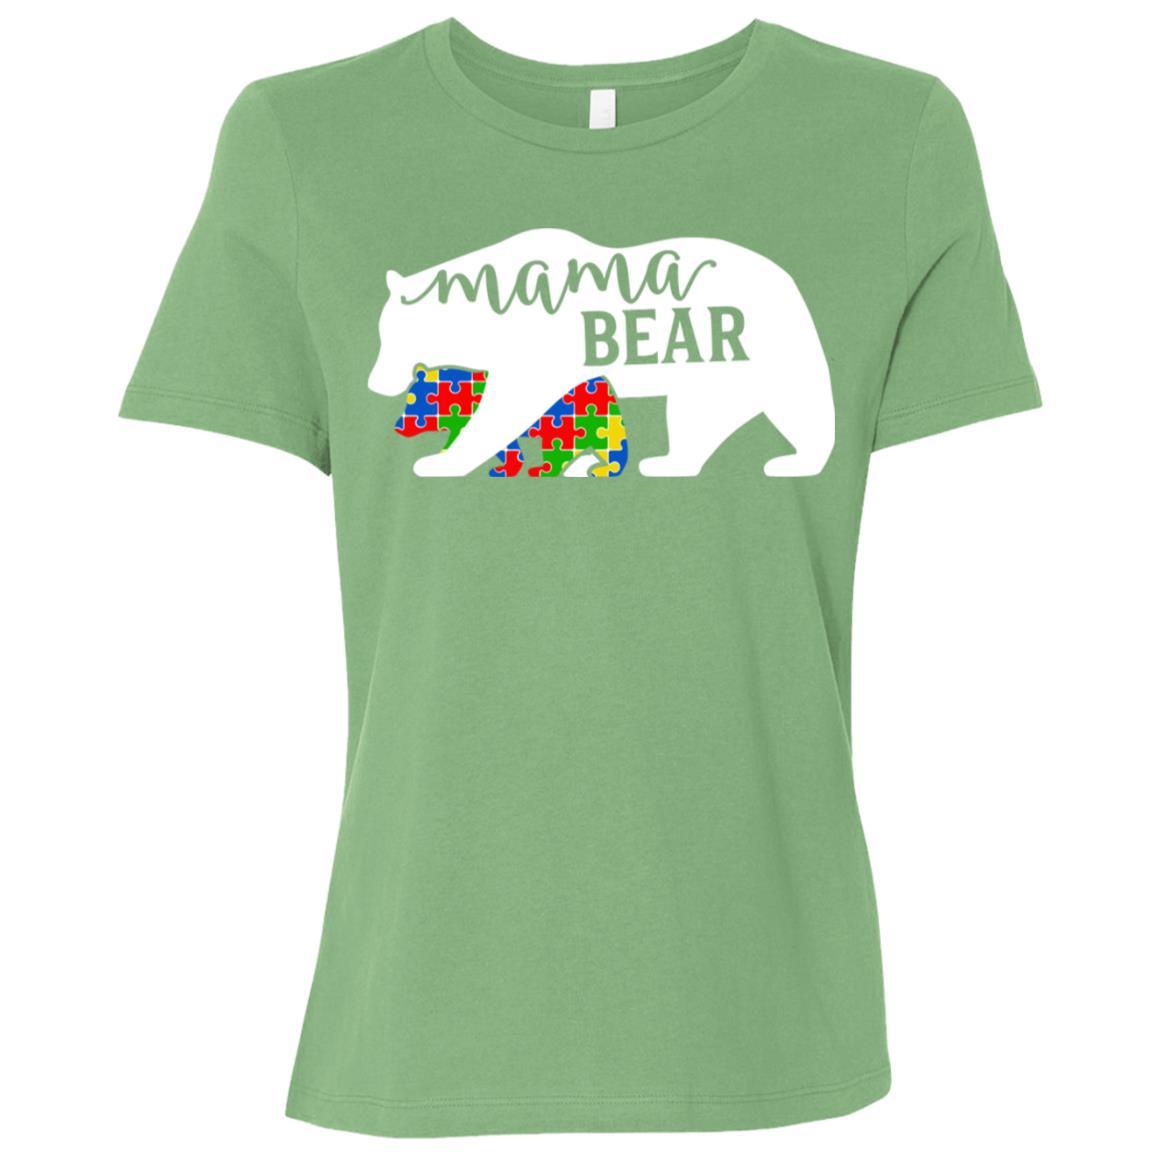 Mom Mama Bear Autism Awareness Month Family Support Women Short Sleeve T-Shirt